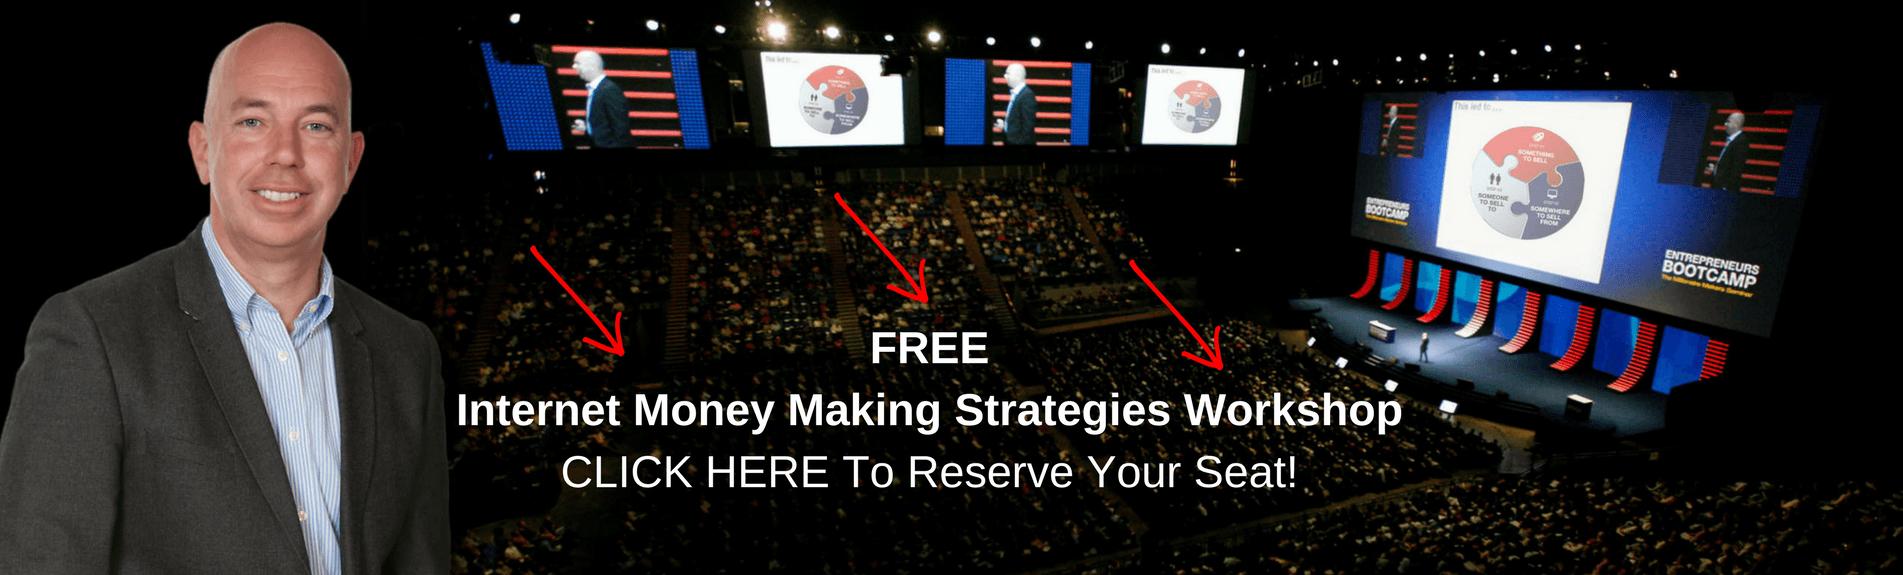 FREE Internet Money Making Strategies Workshop